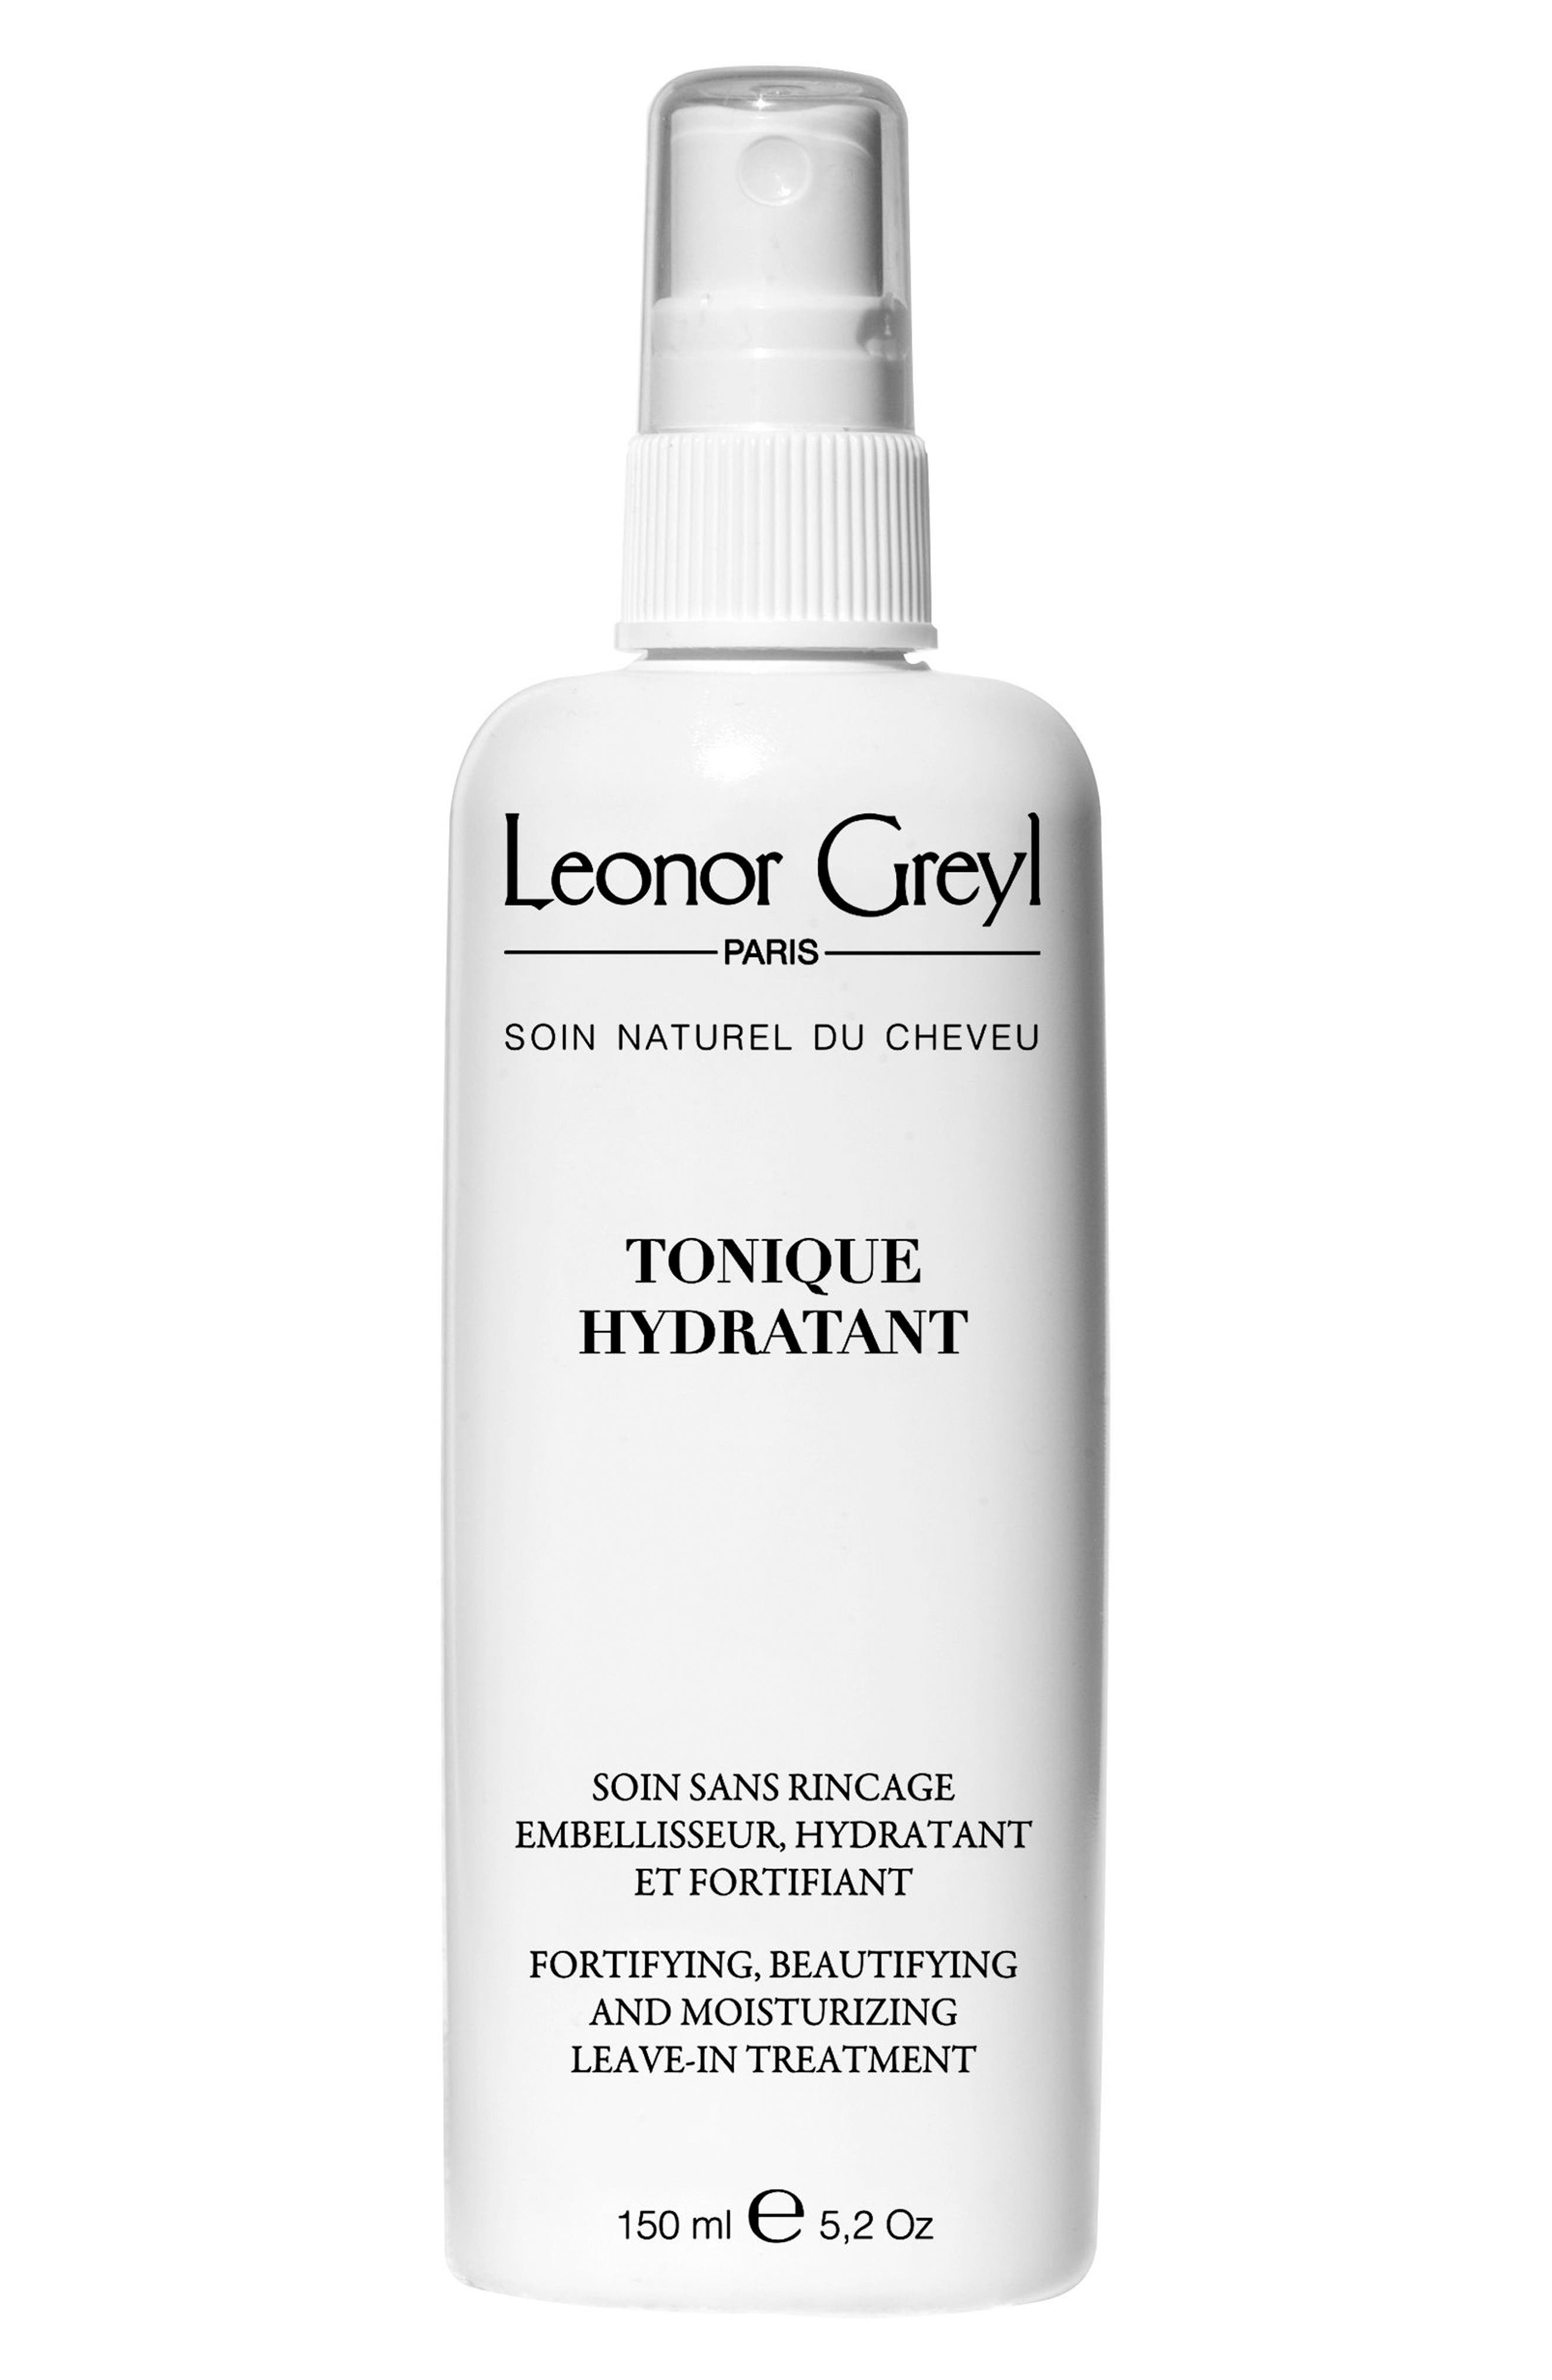 Leonor Greyl PARIS 'Tonique Hydratant' Leave-In Treatment Mist